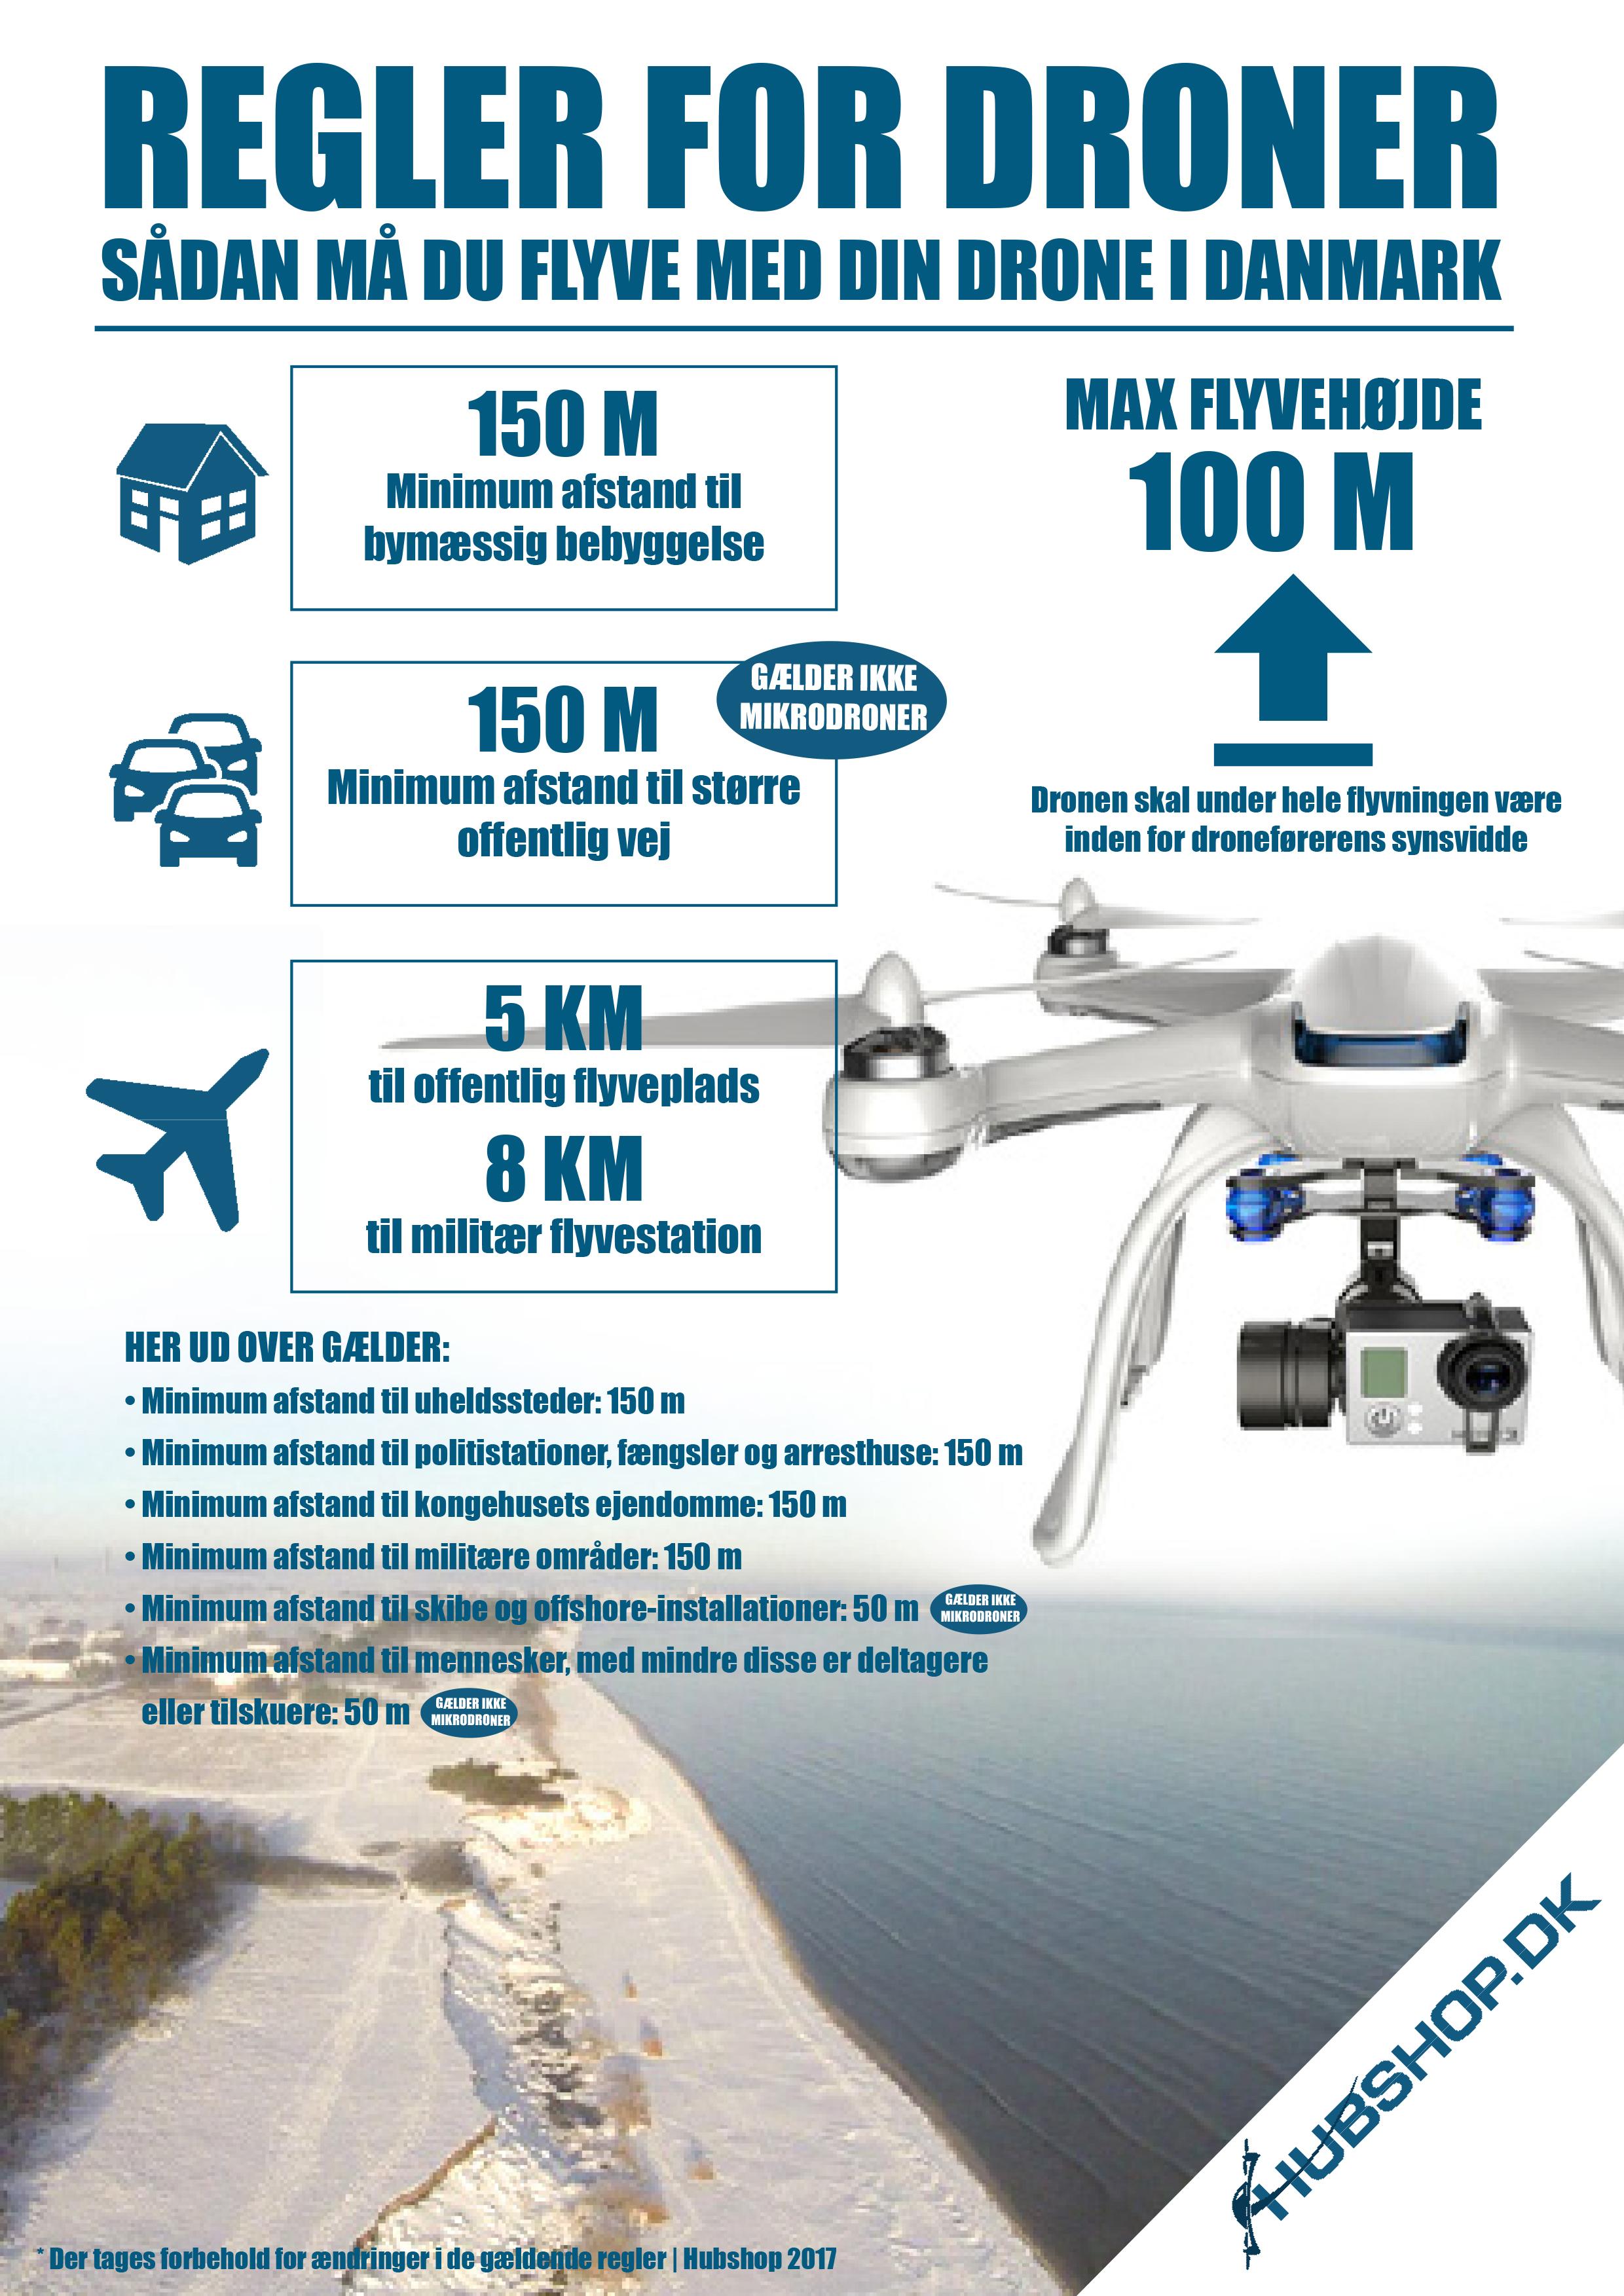 Regler for droneflyvning